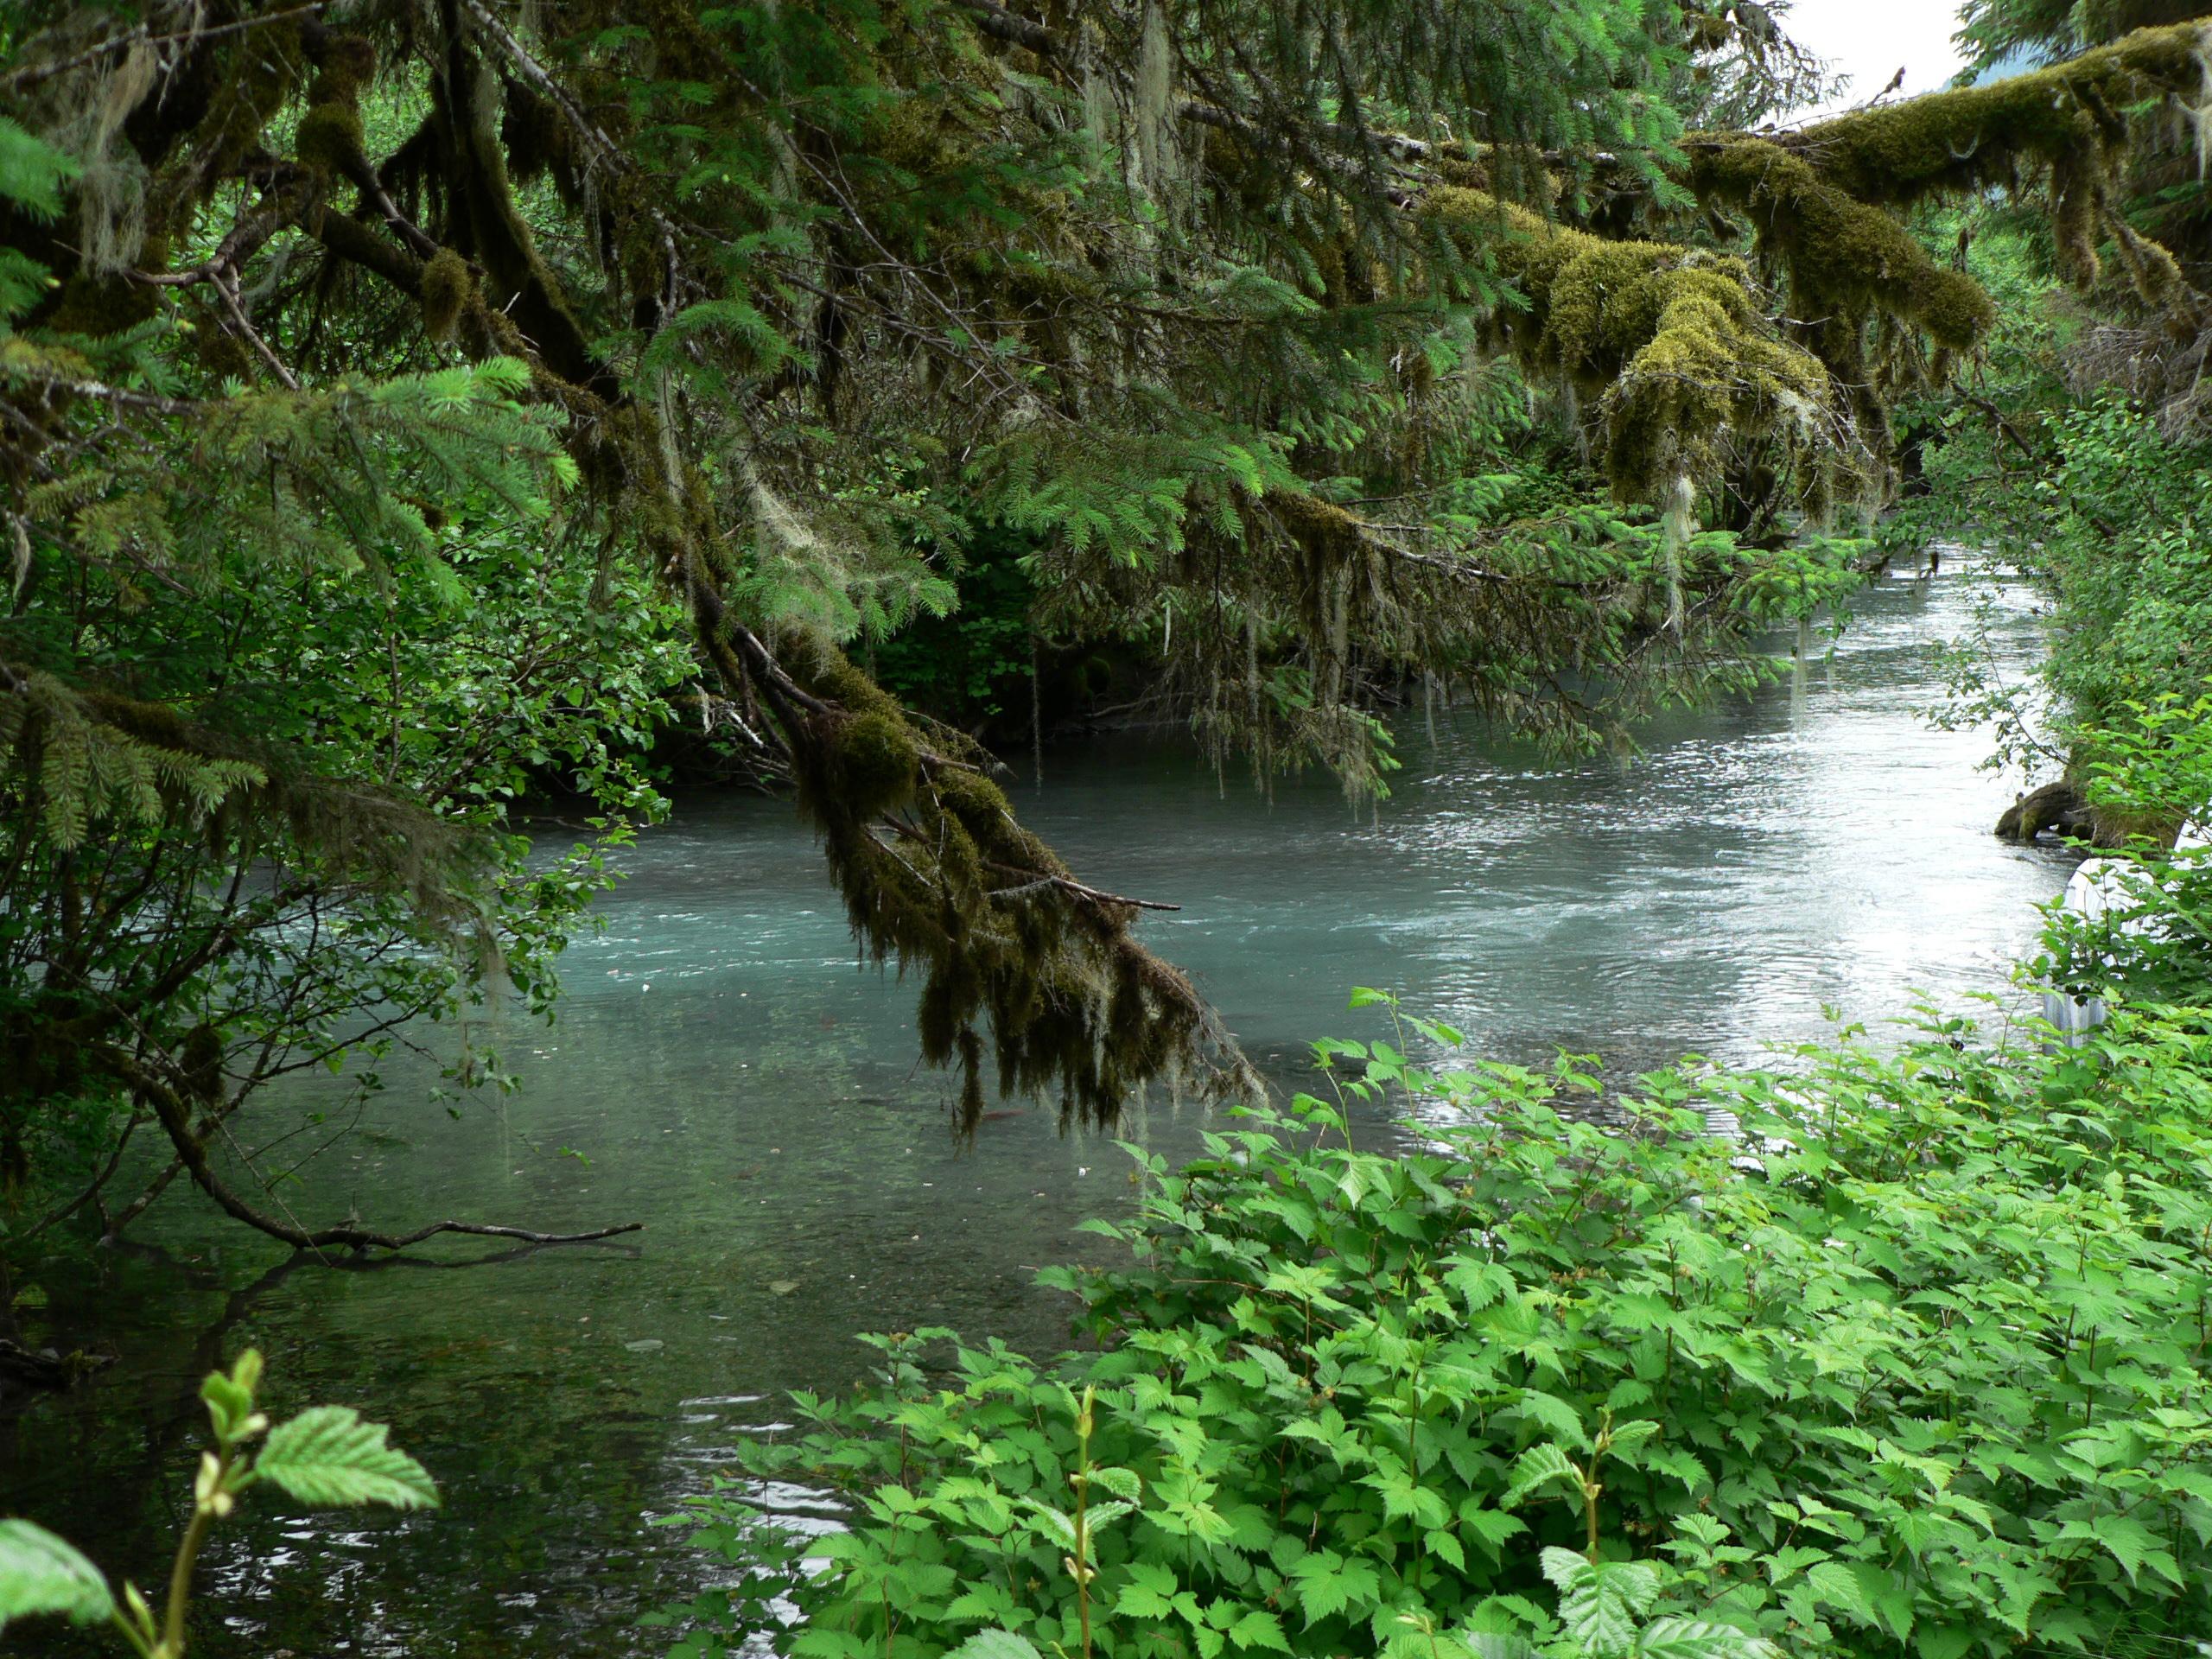 File:Cordova Power Creek Salmon Stream.jpg